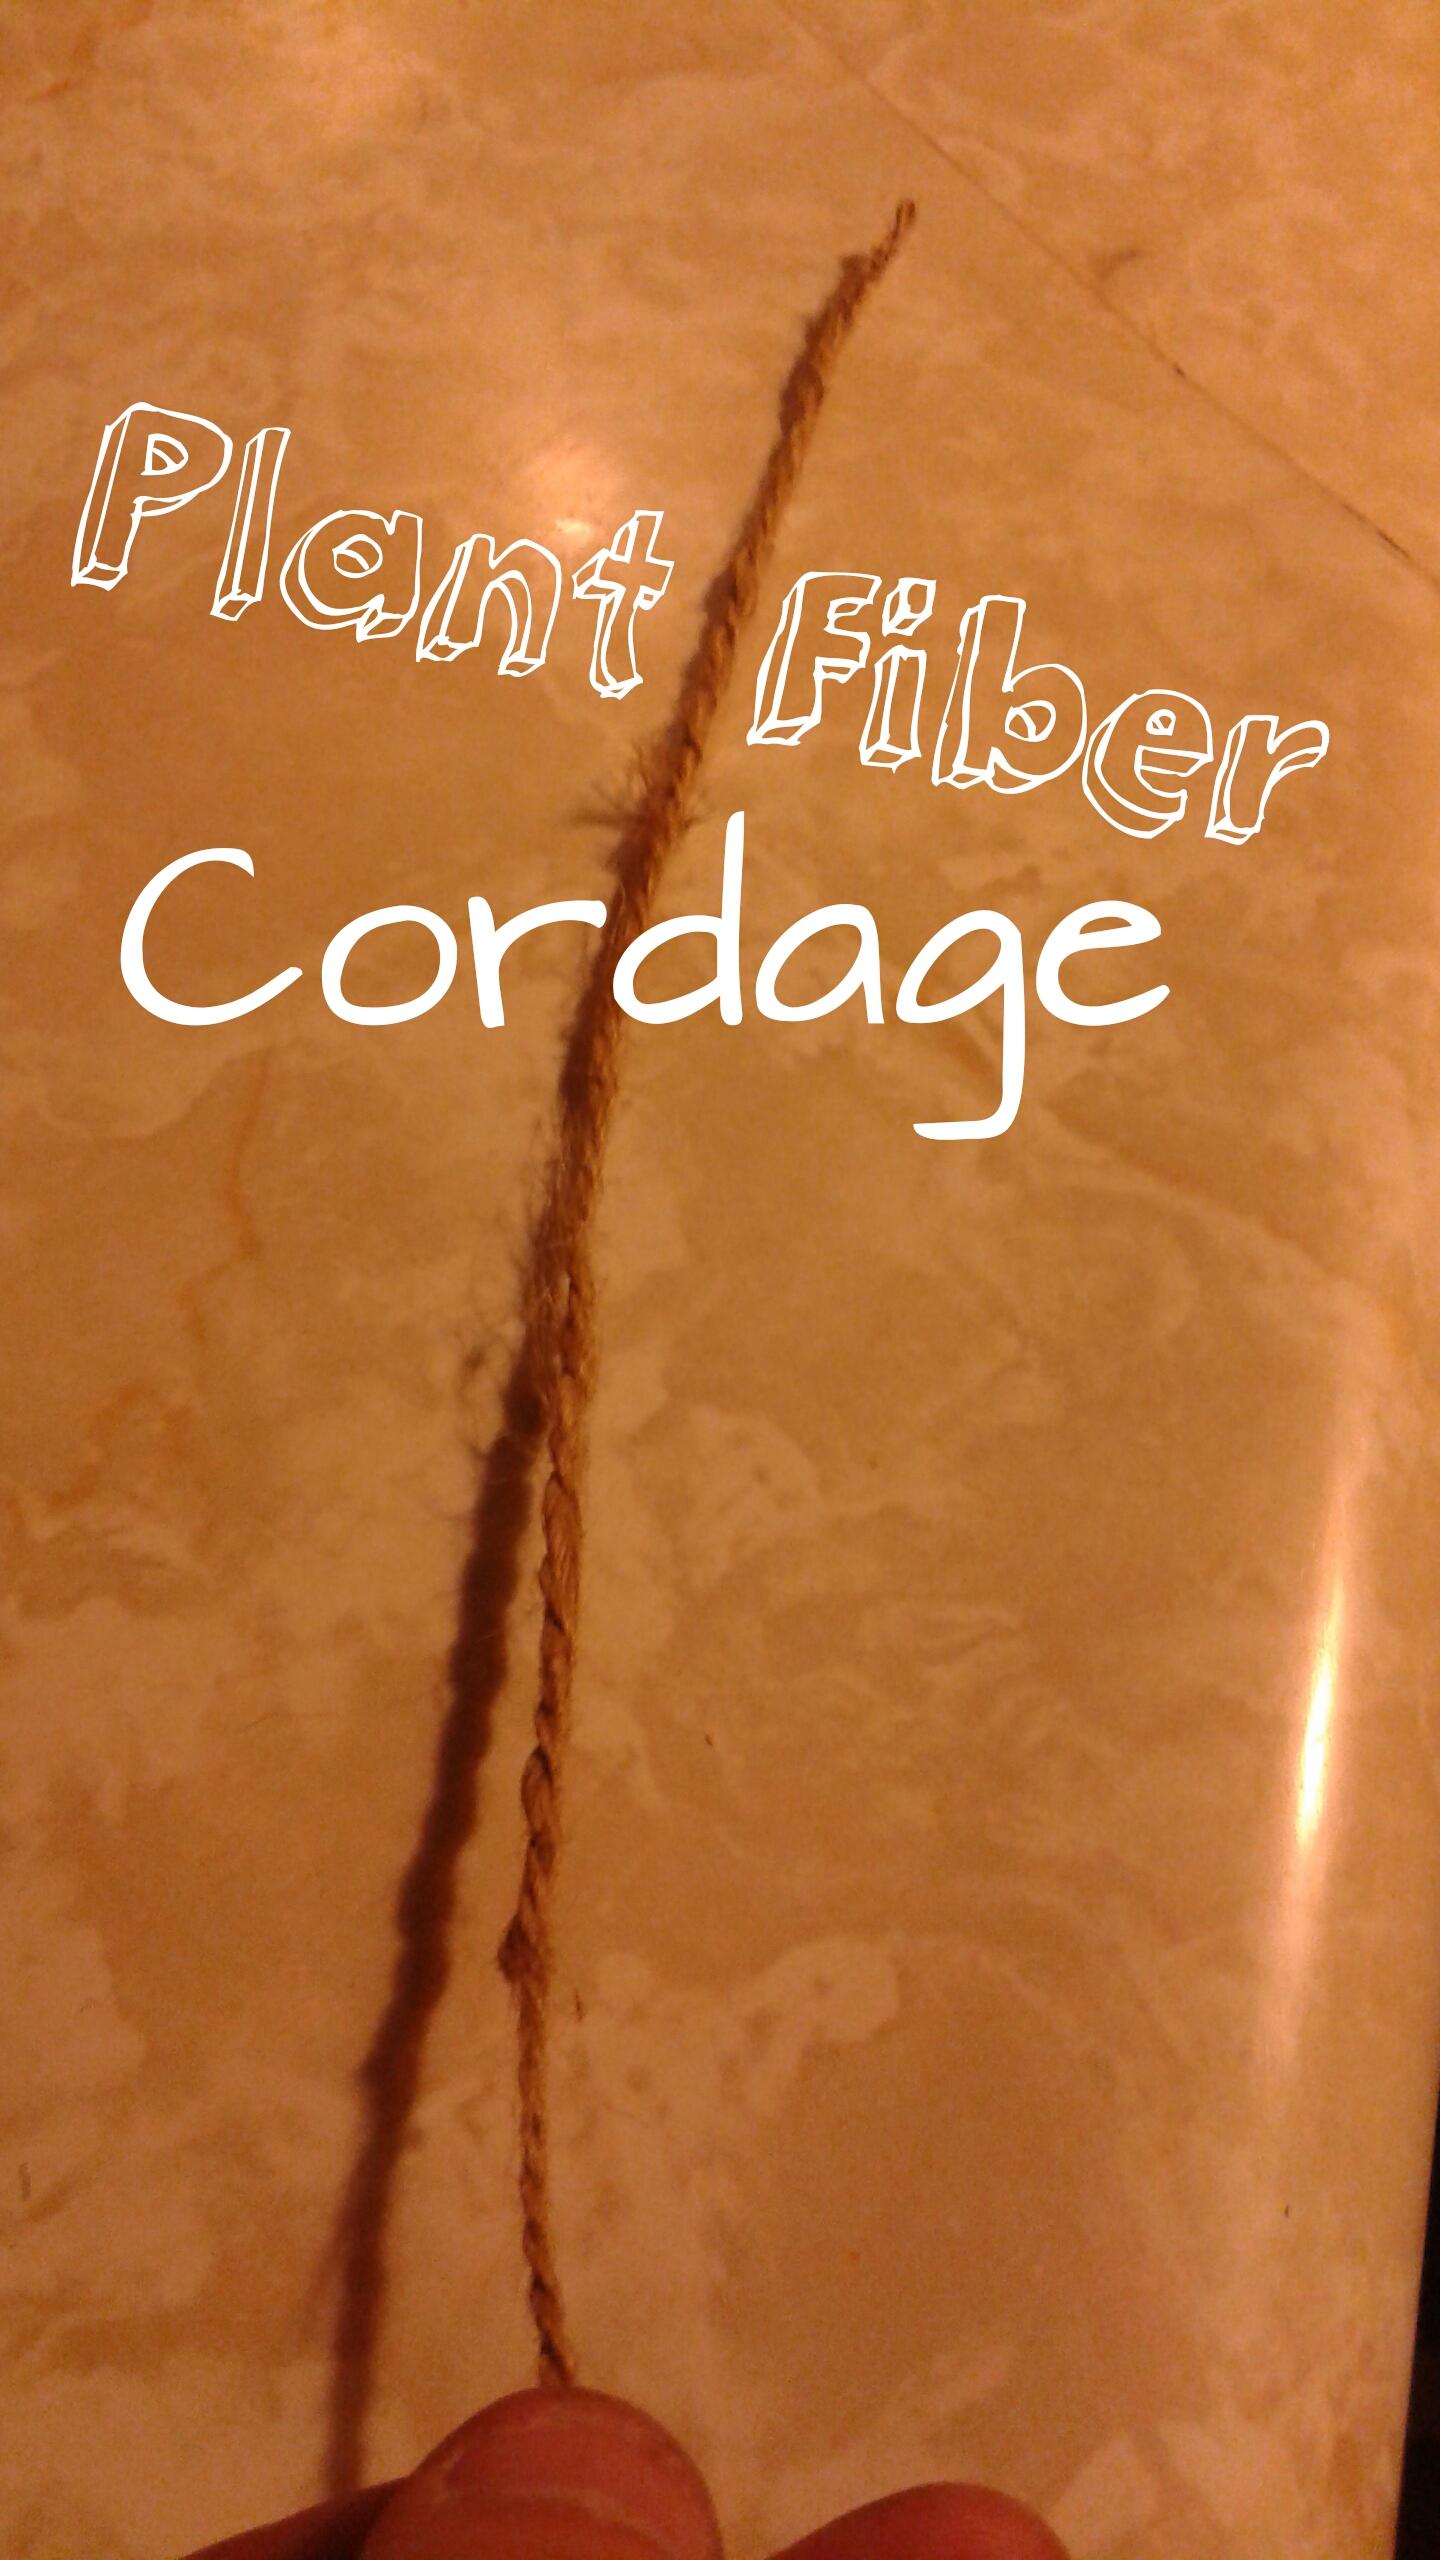 Picture of Plant Fiber Cordage